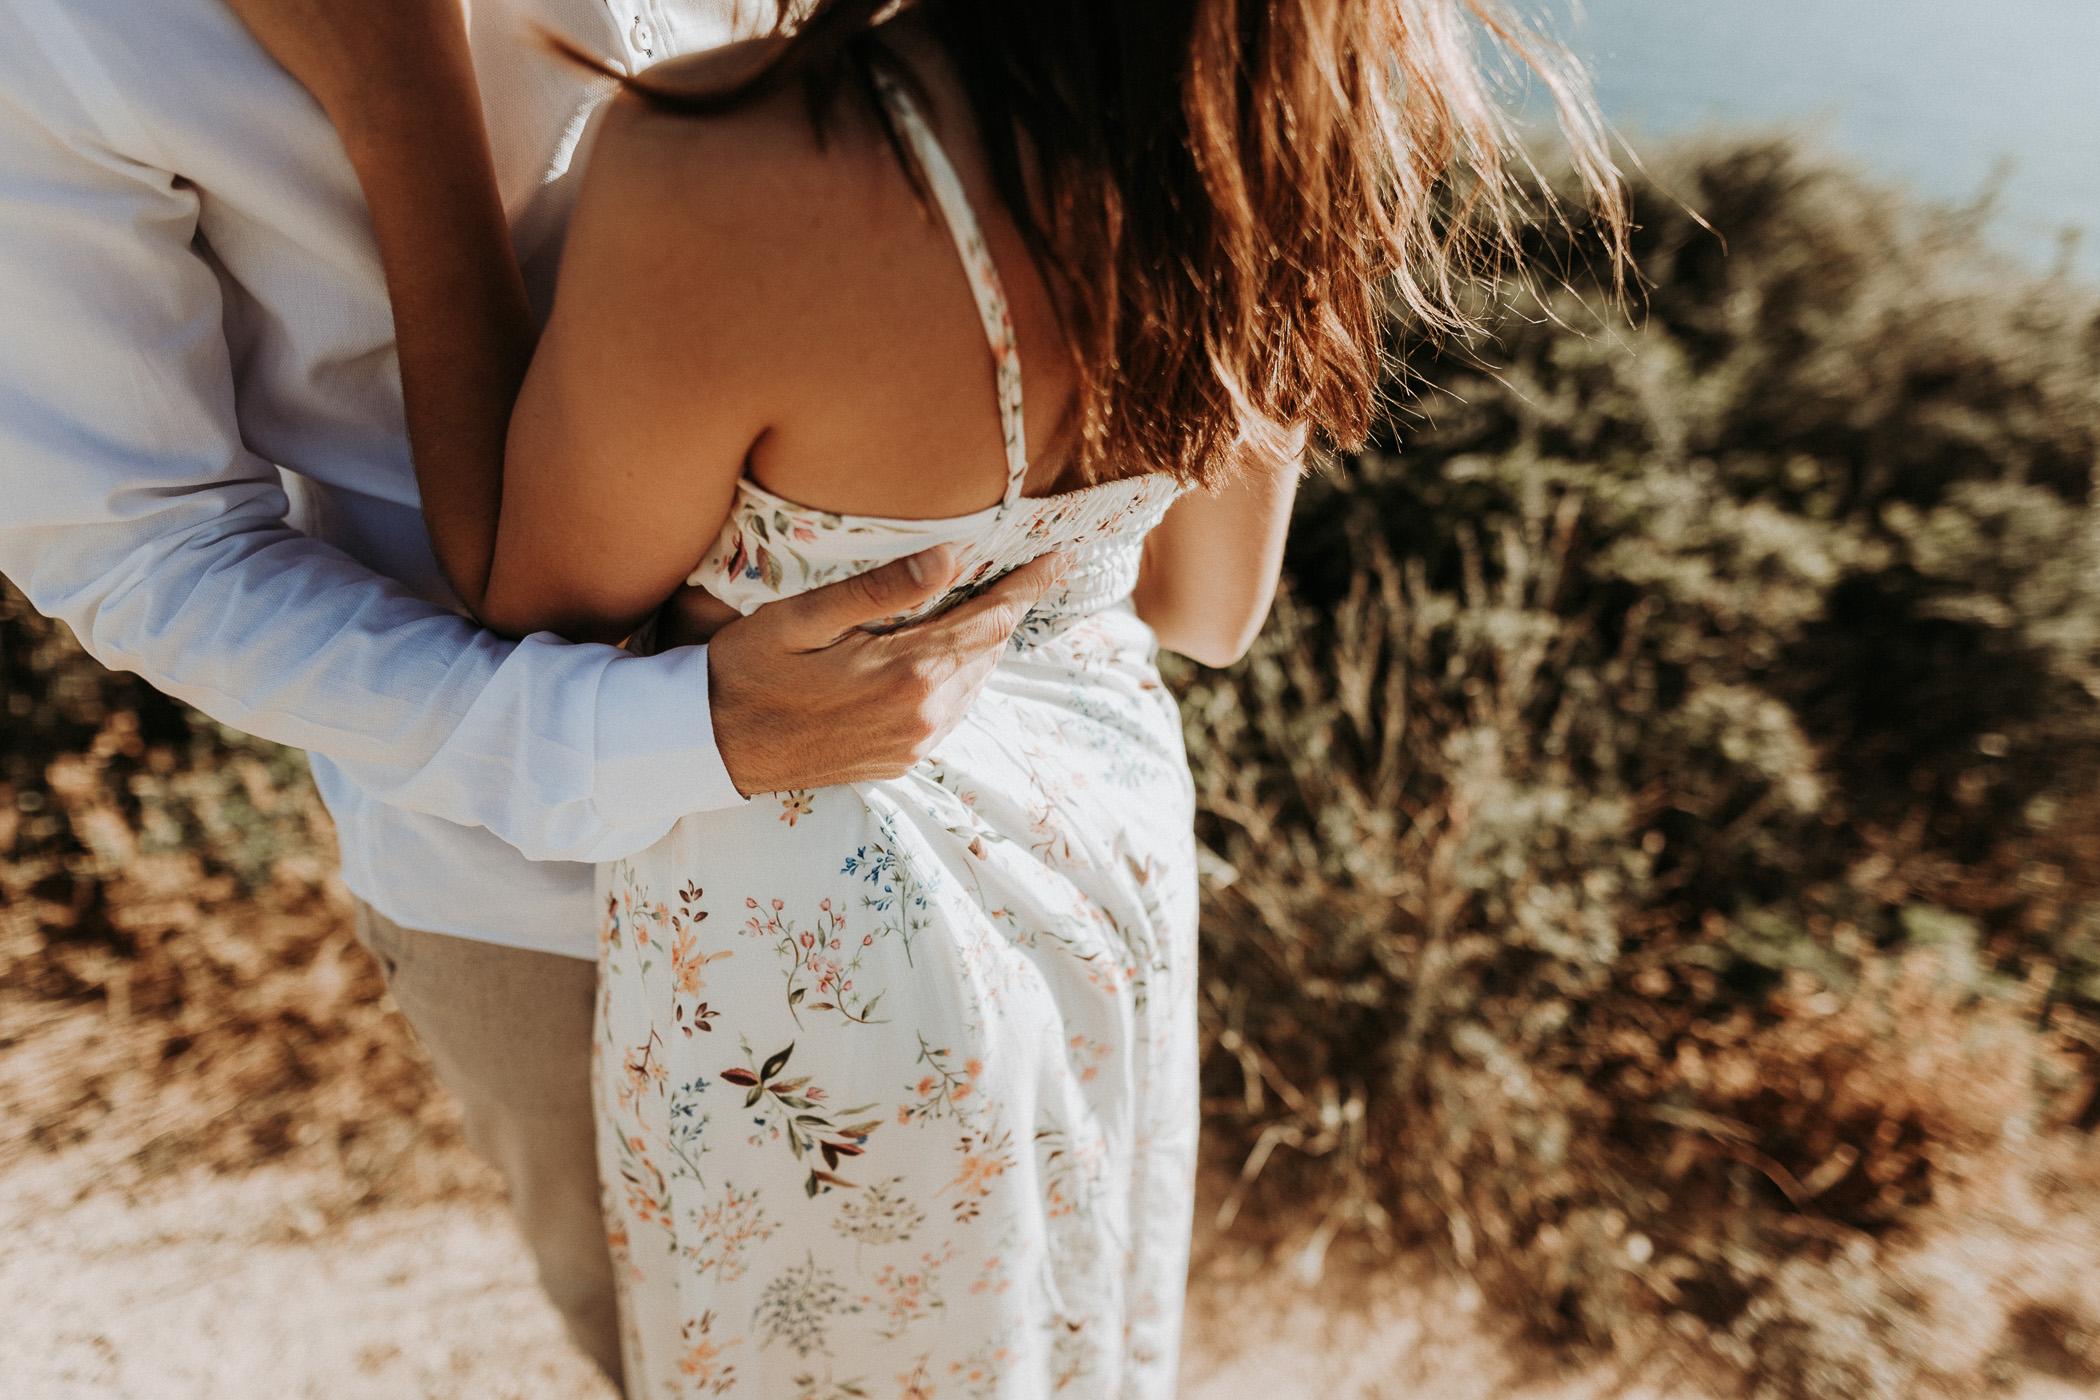 DanielaMarquardtPhotography_wedding_elopement_mallorca_spain_calapi_palma_lauraandtoni_138